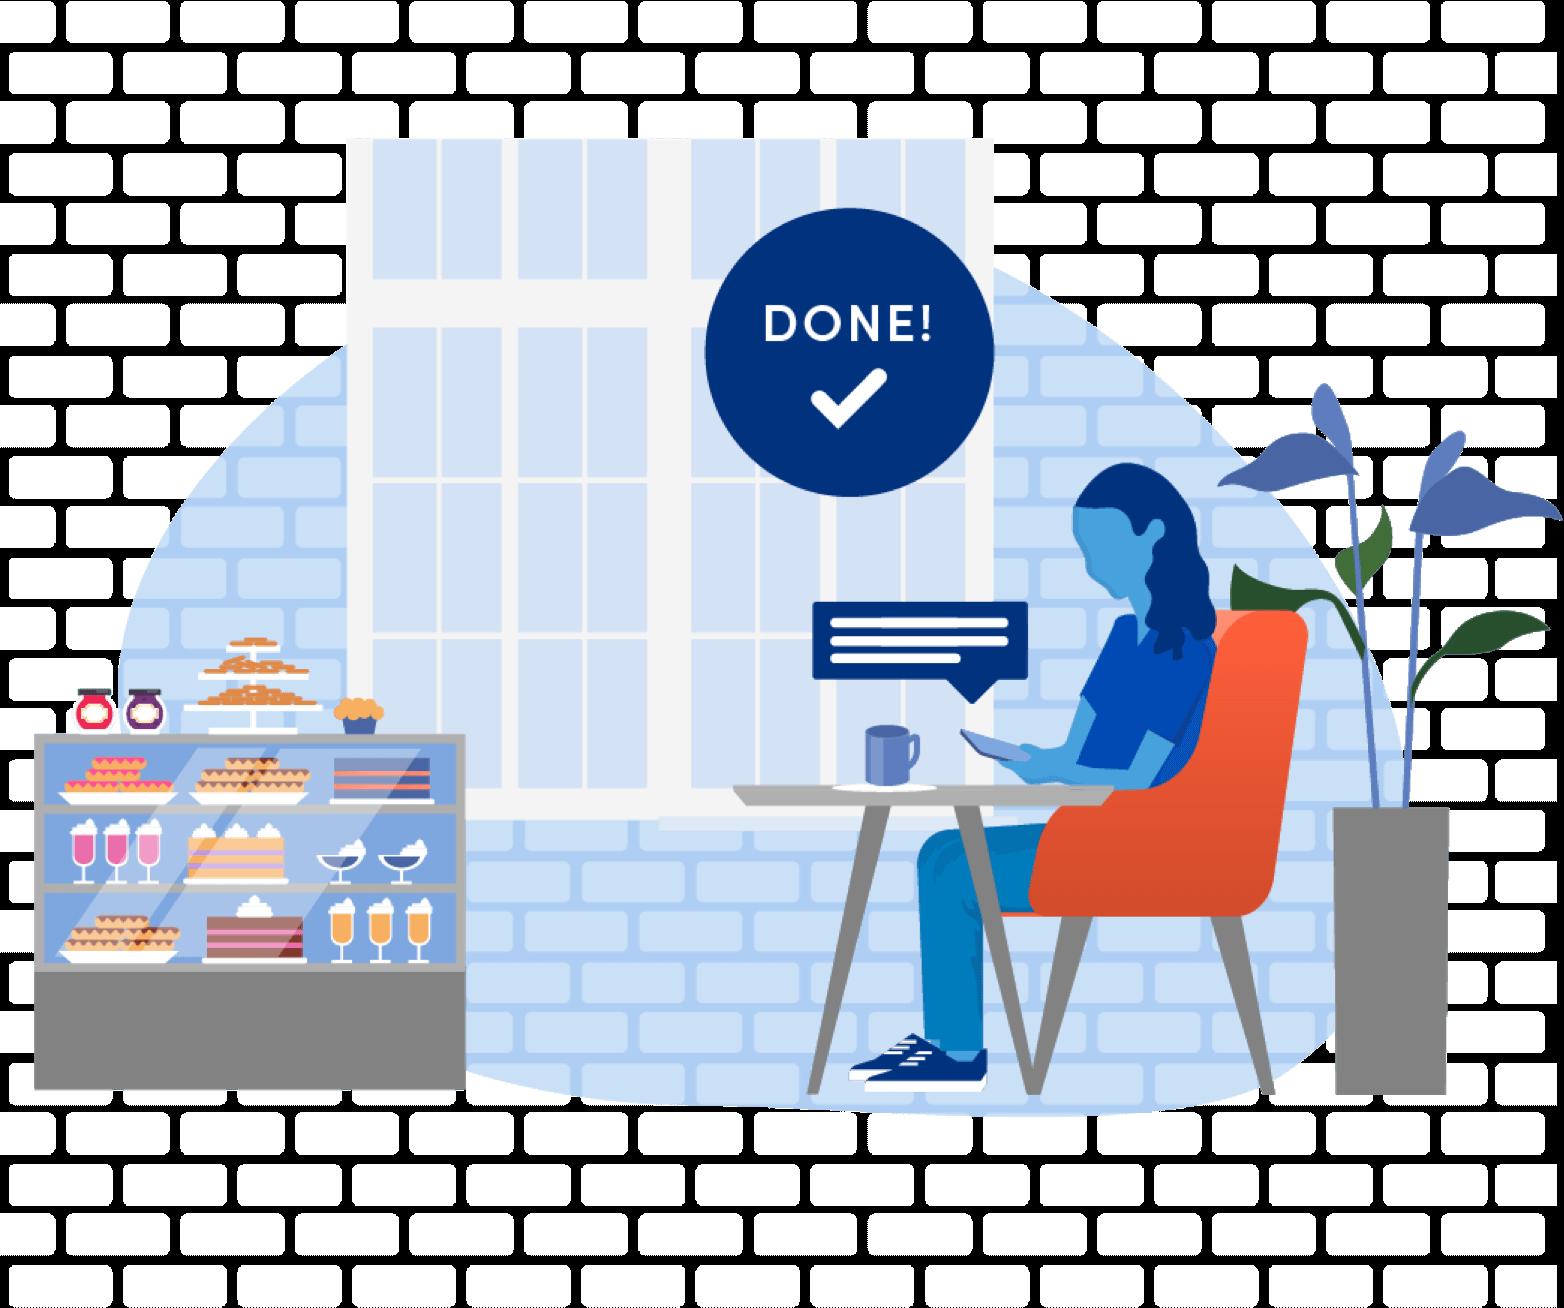 Automated Campaign illustration